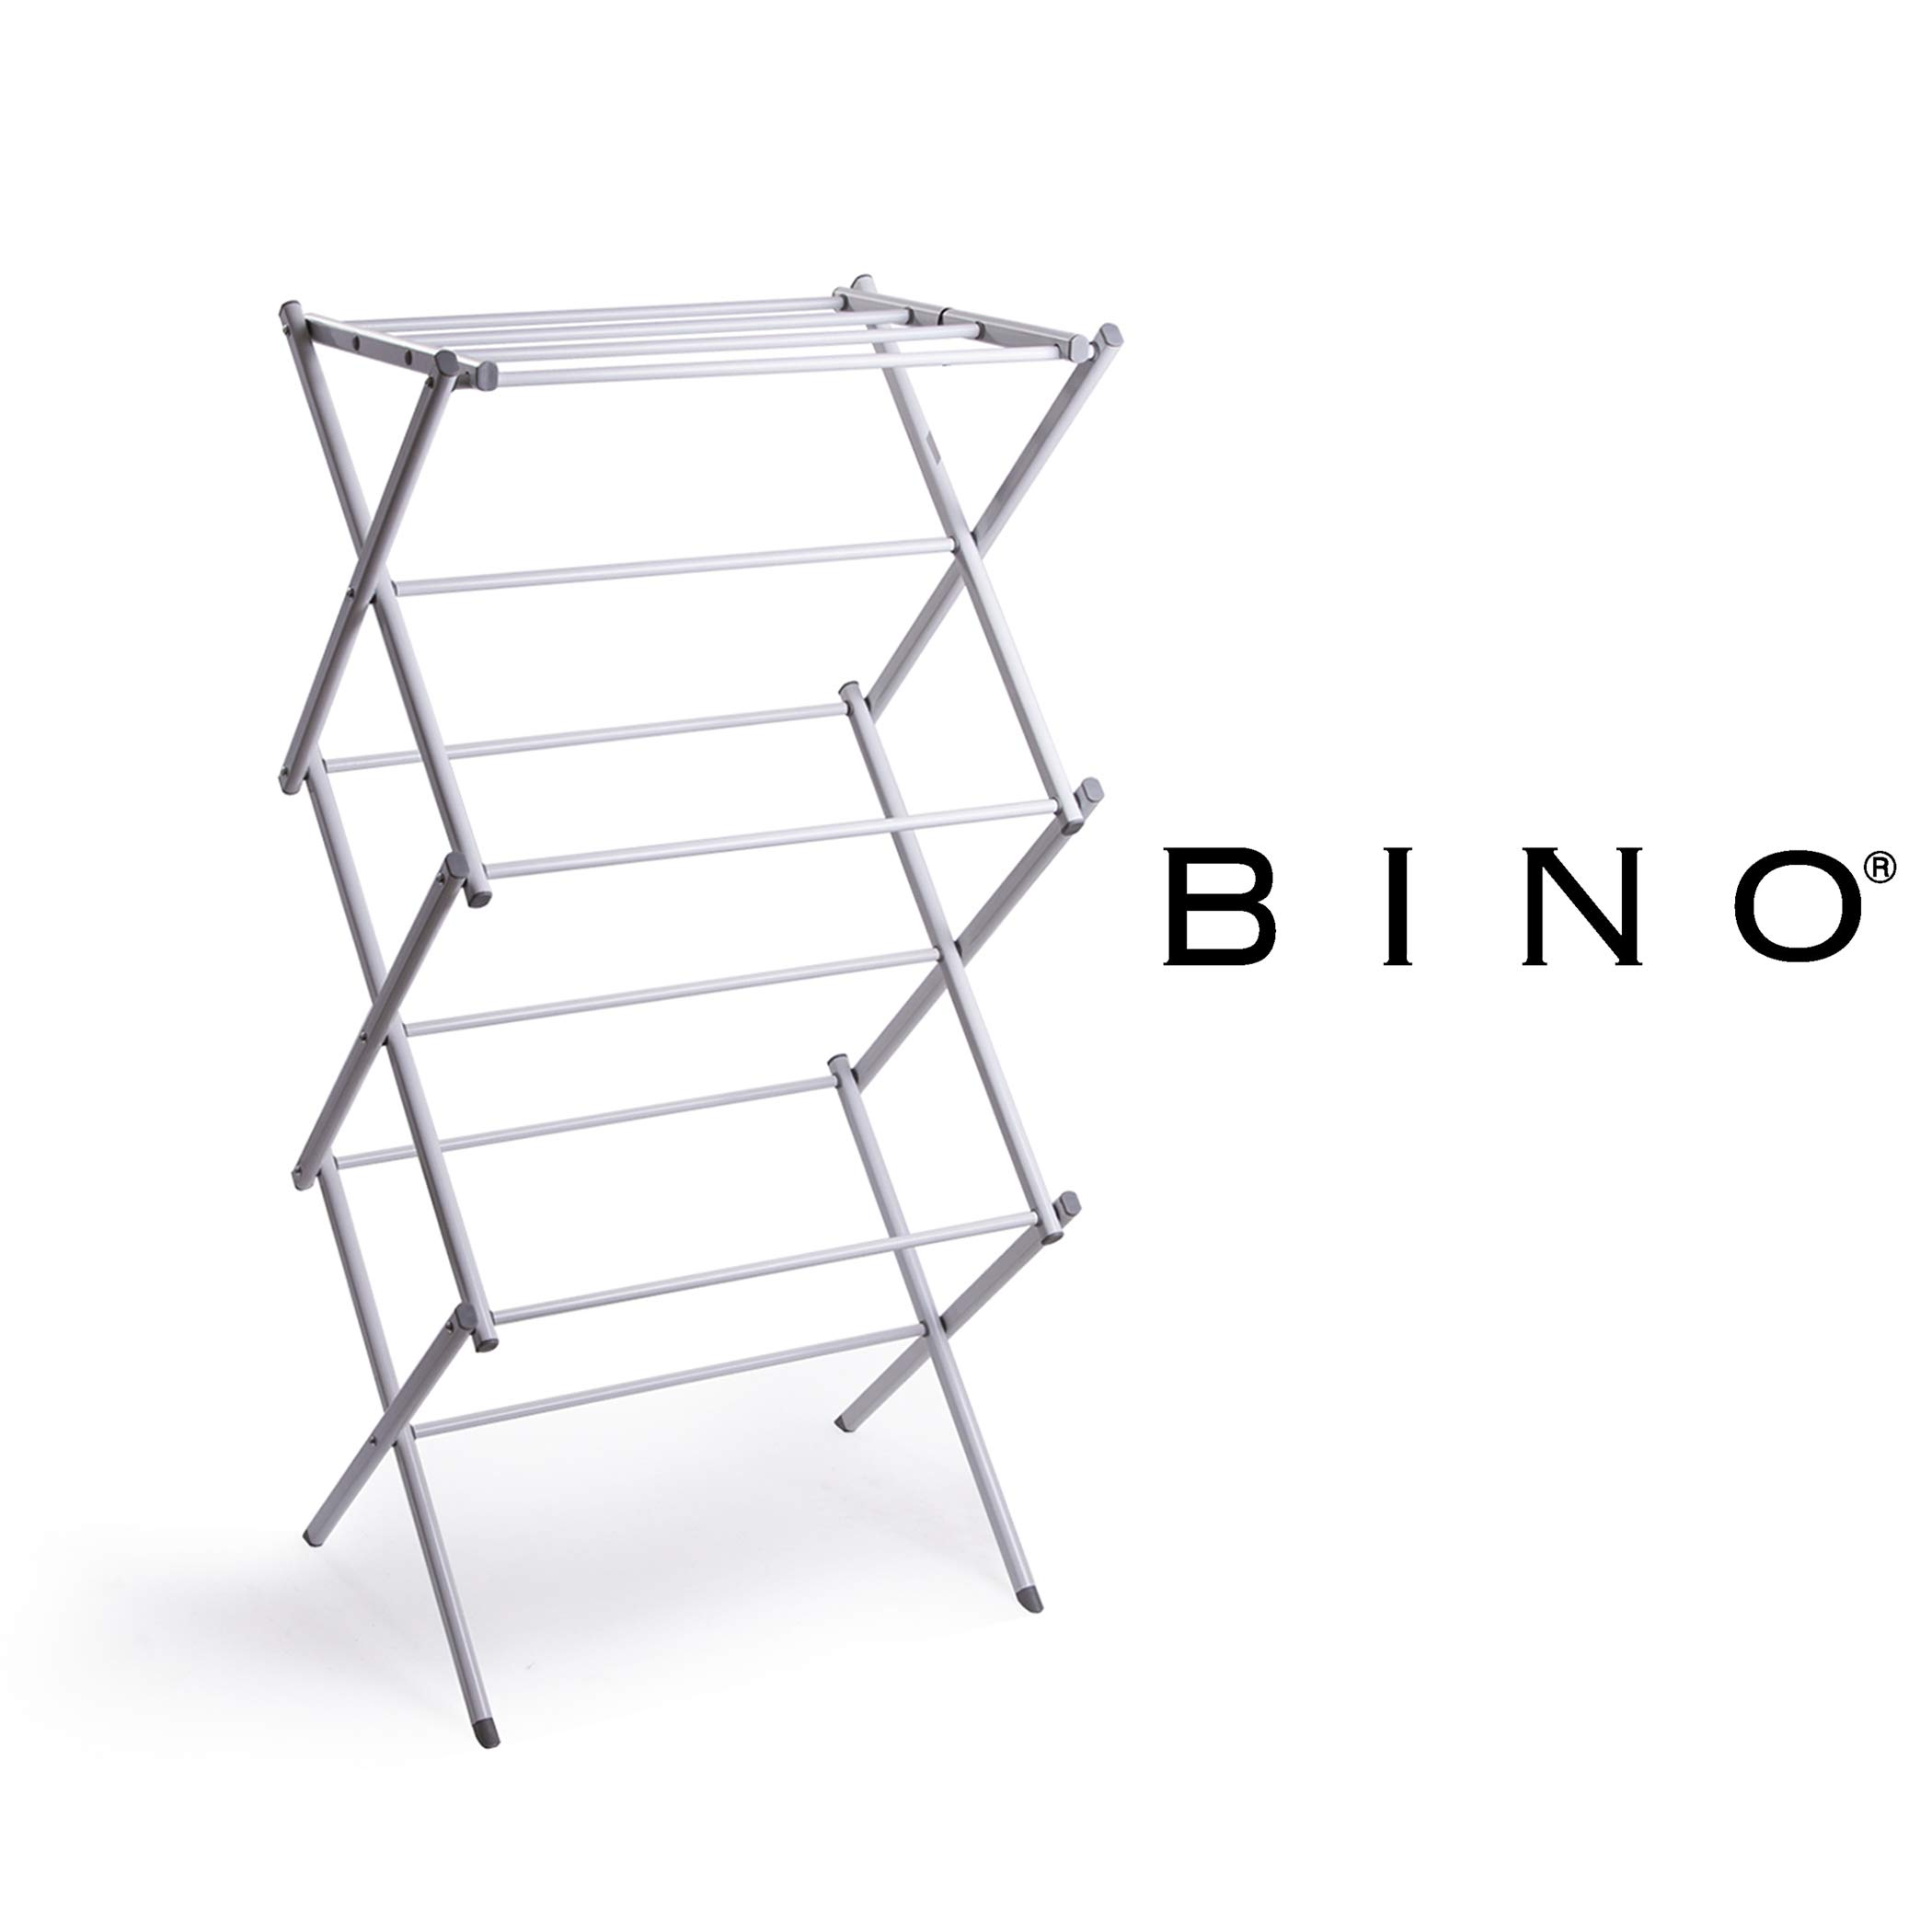 BINO 3-Tier Collapsing Foldable Laundry Drying Rack, White